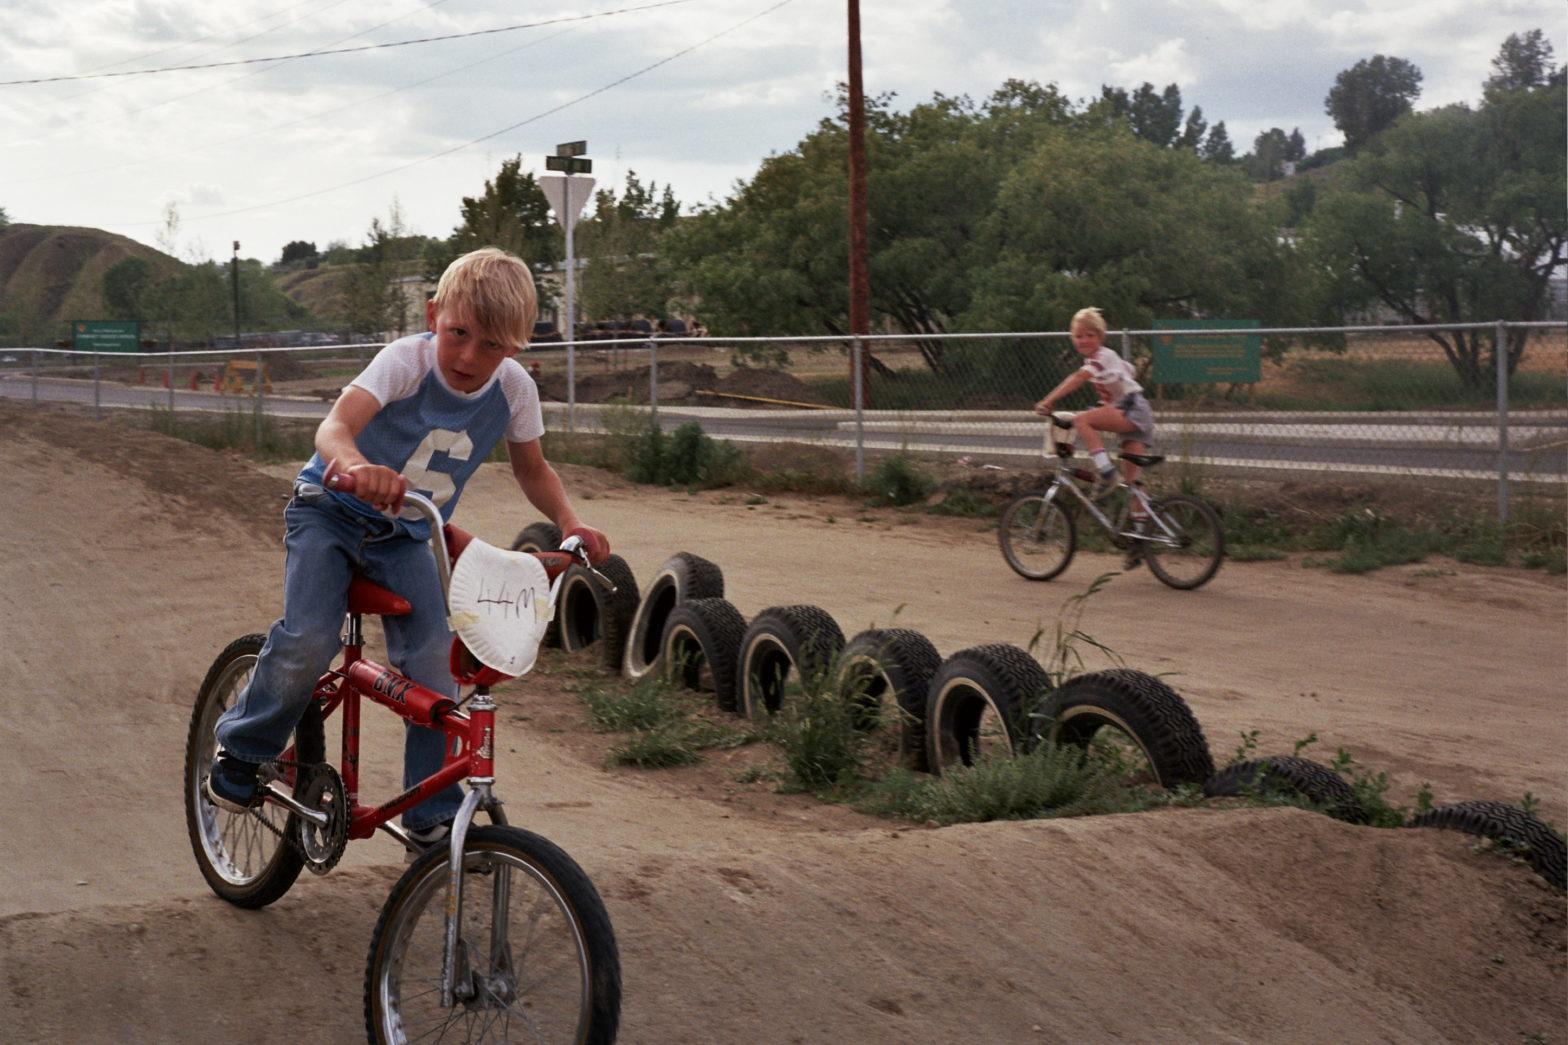 Jeff Milner riding BMX, Chris MacDonald in the background